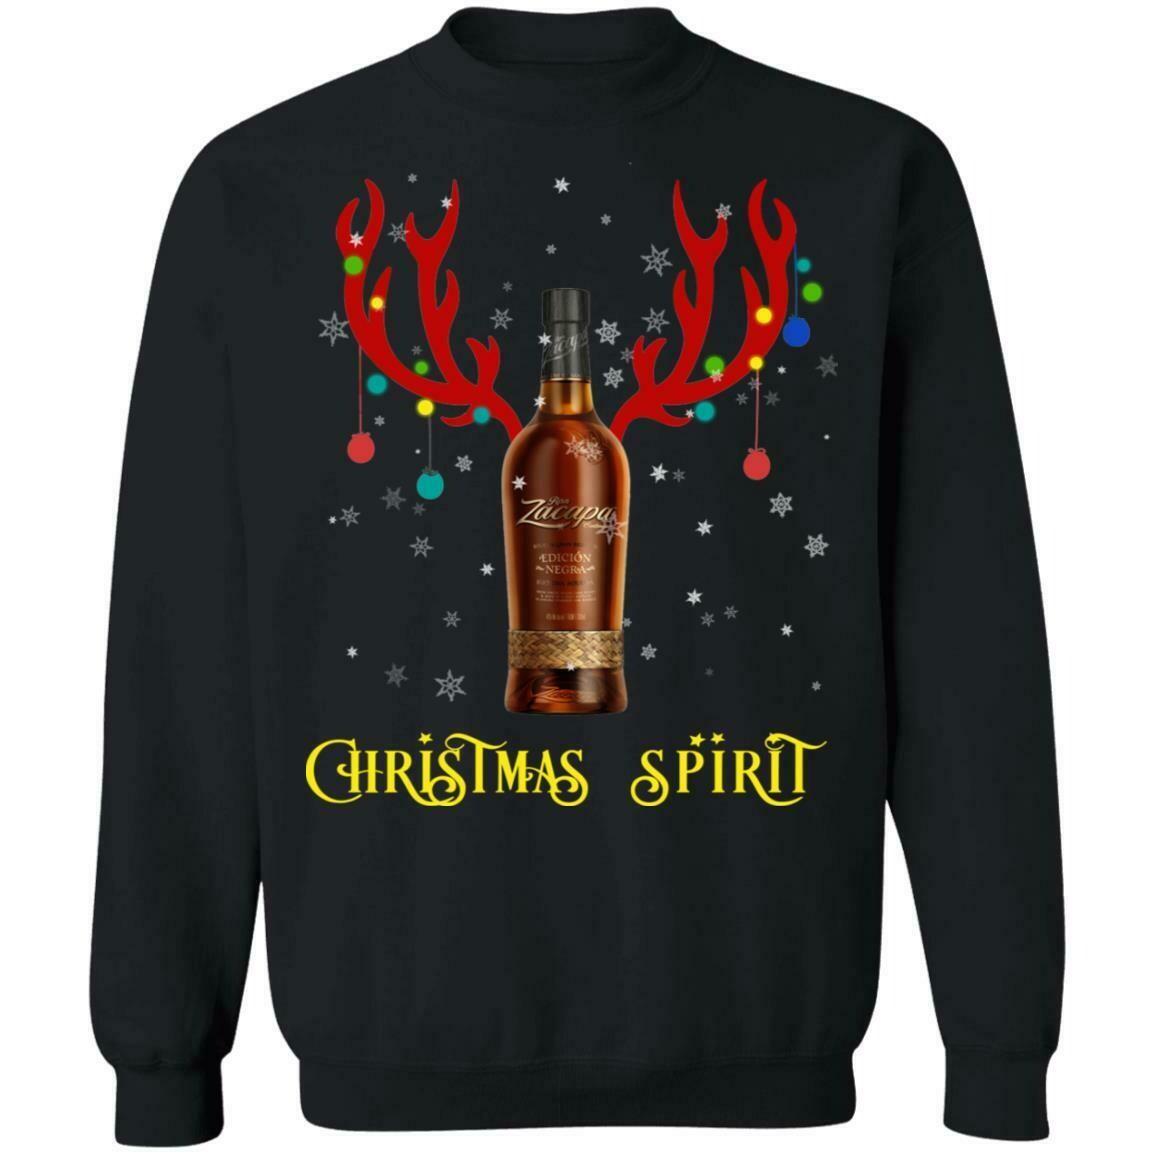 Christmas Sweater Zacapa Christmas Spirit Reindeer Rum Shirt  Christmas Couples Shirts, Rudolph Shirt, Couples Winter T-Shirts, Christmas Couple, Matching Shirts, Raindeer Shirt